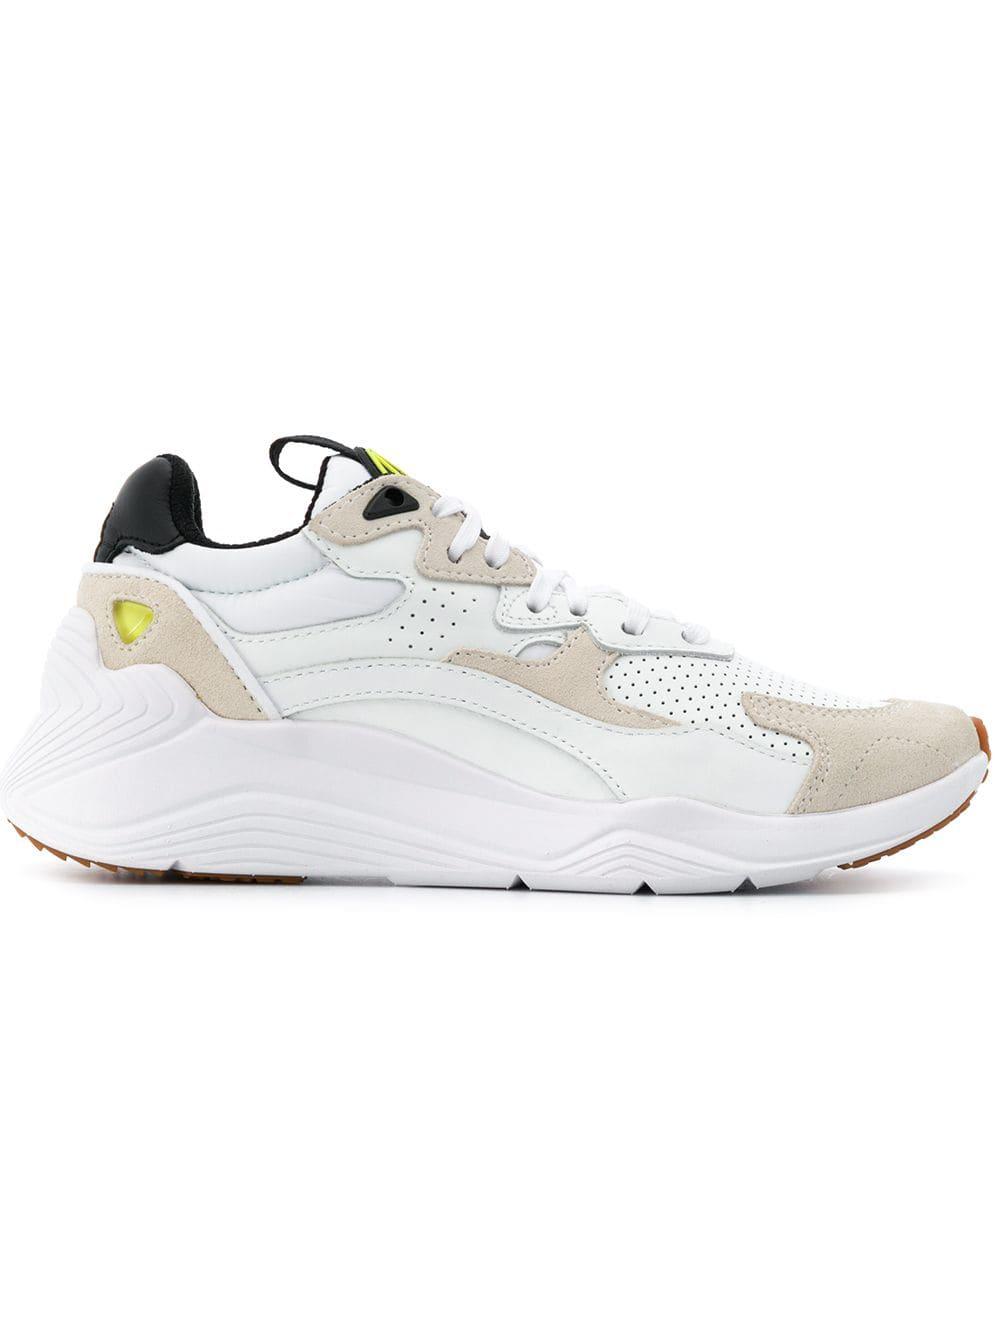 big sale 782c2 0237e Mcq Alexander Mcqueen Daku Sneakers - White